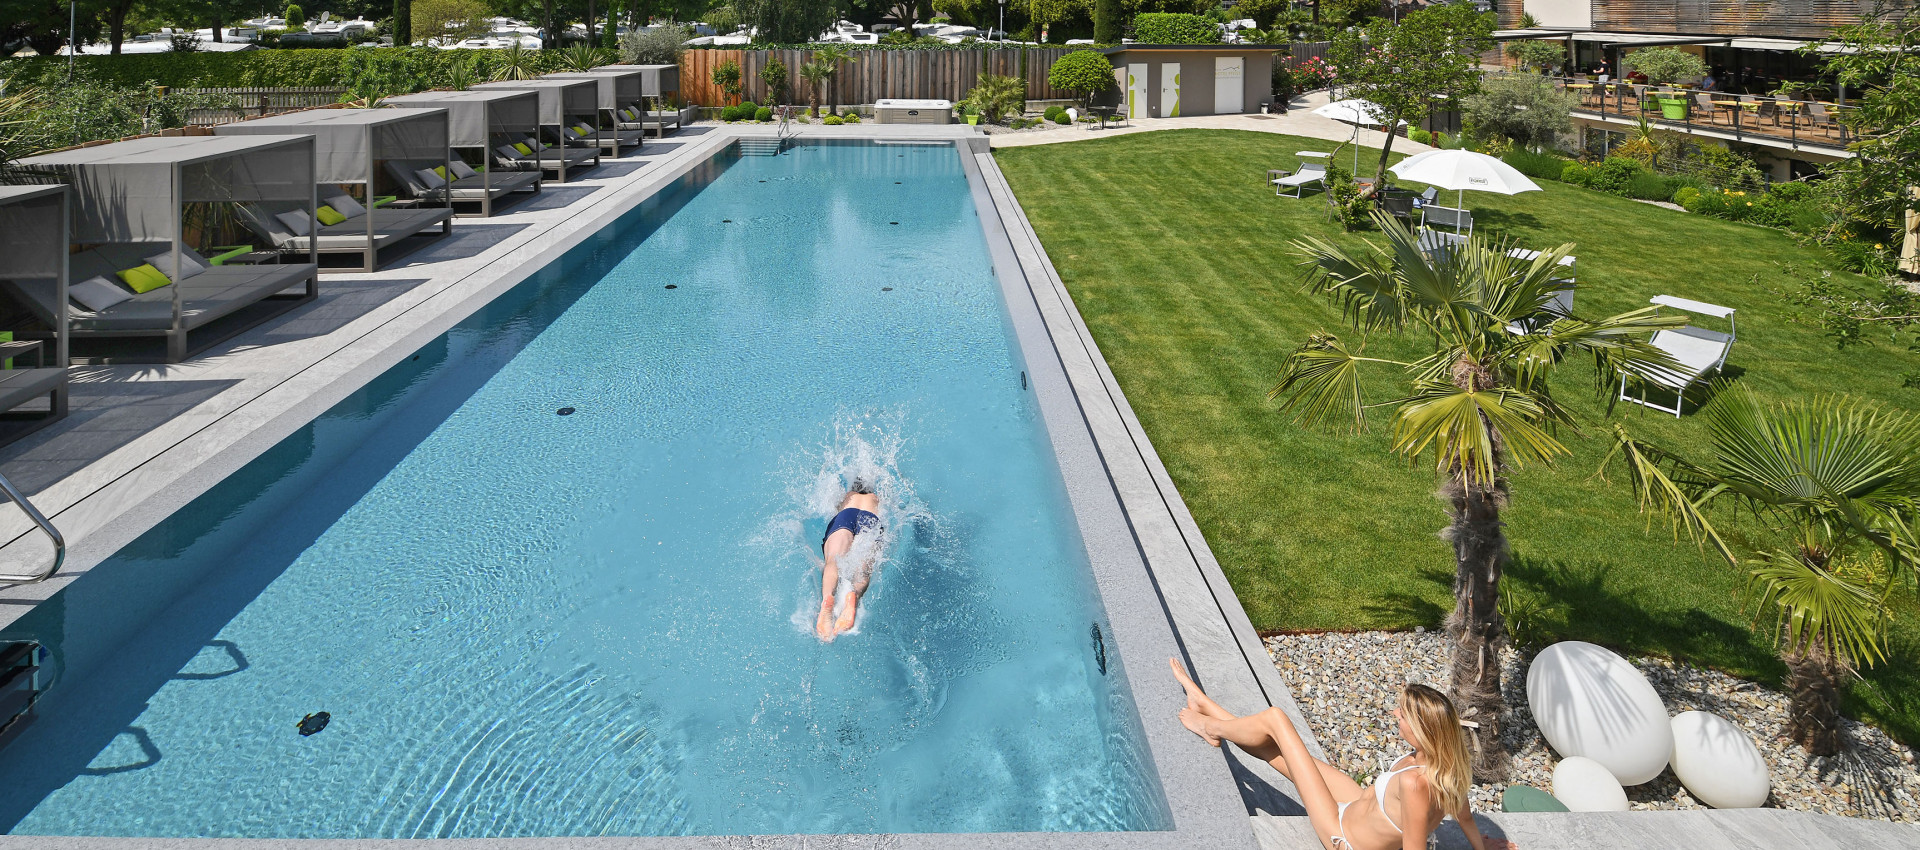 Hotel Pfeiss Lana Outdoor Pool